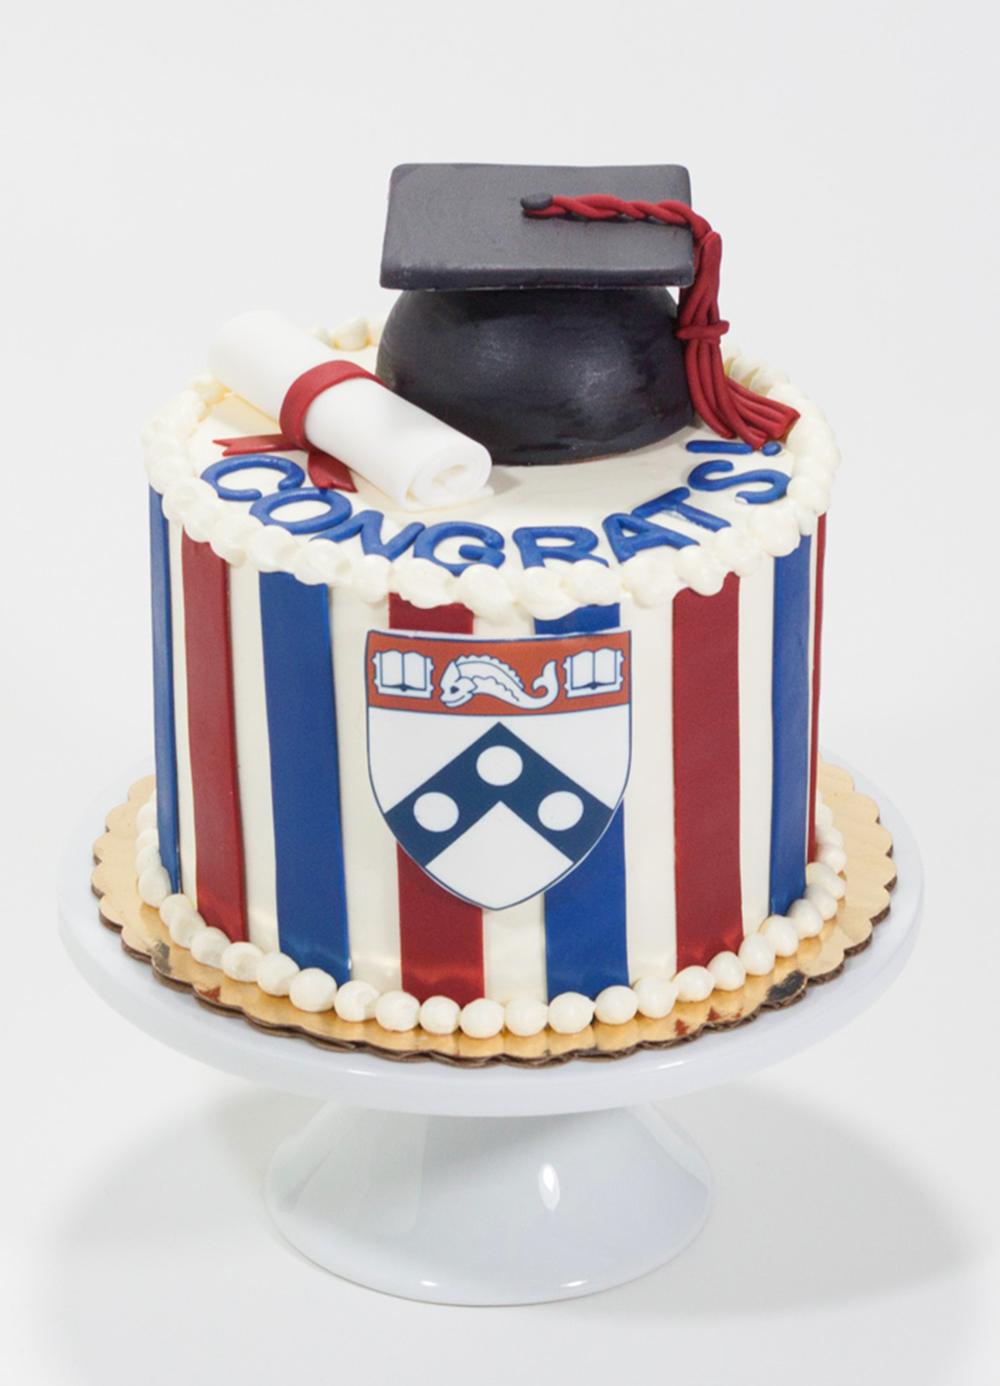 UPENN-graduation-cake-whipped-bakeshop